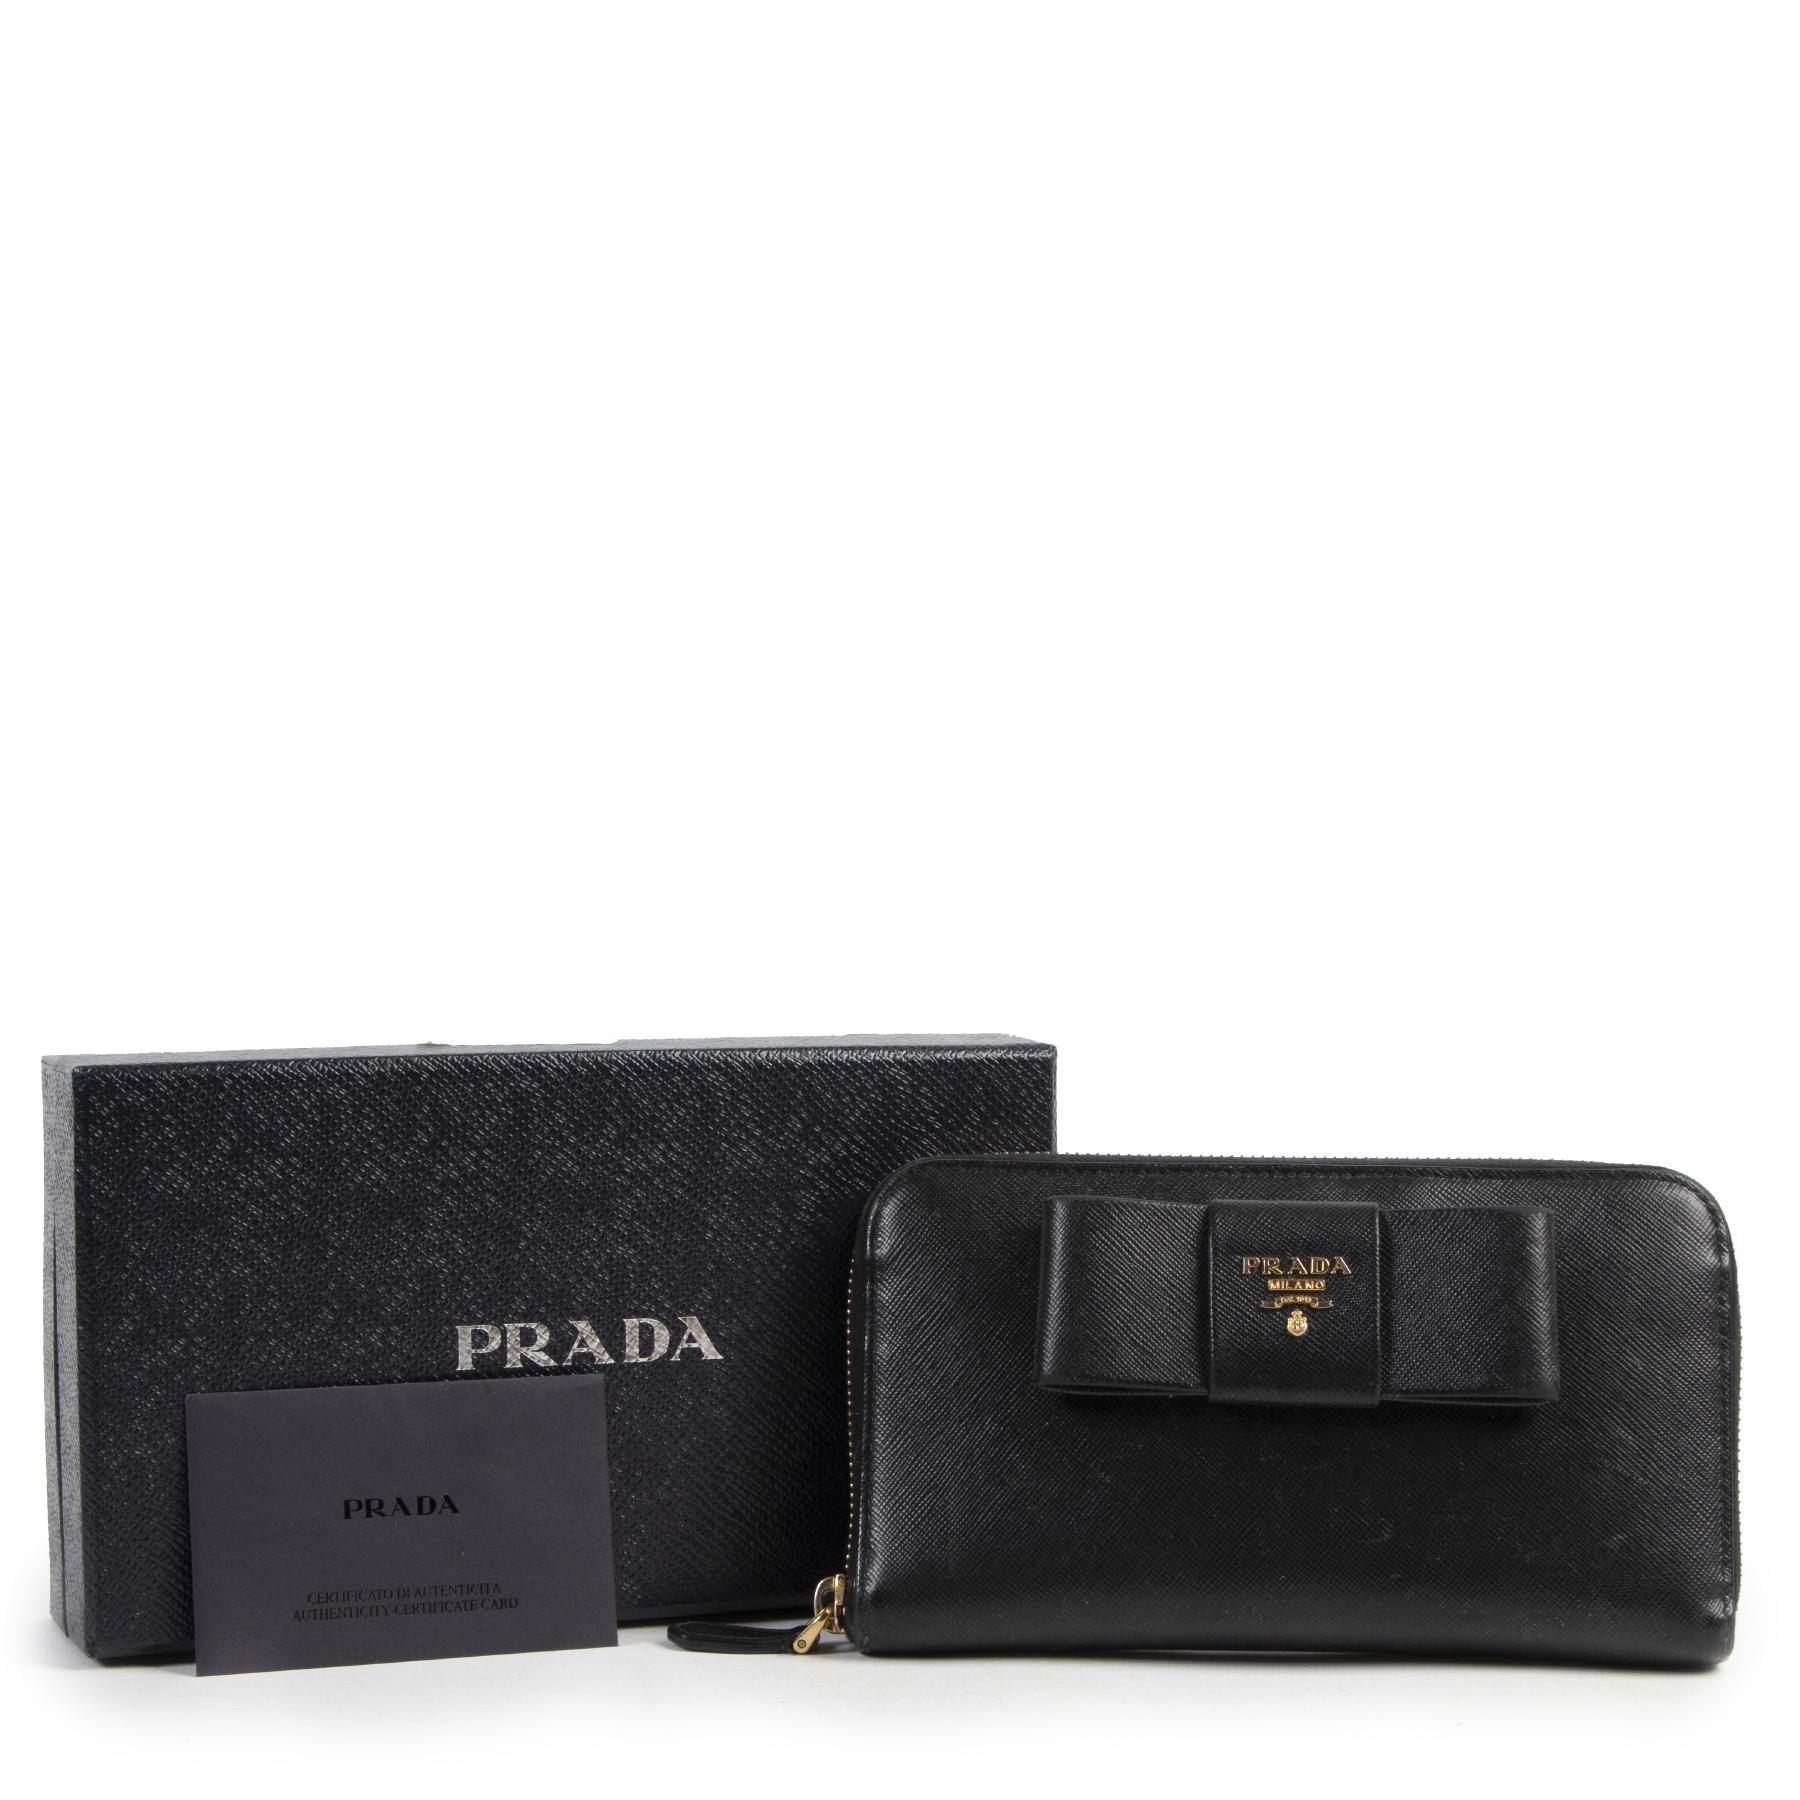 Prada Black Saffiano Leather Bow Wallet